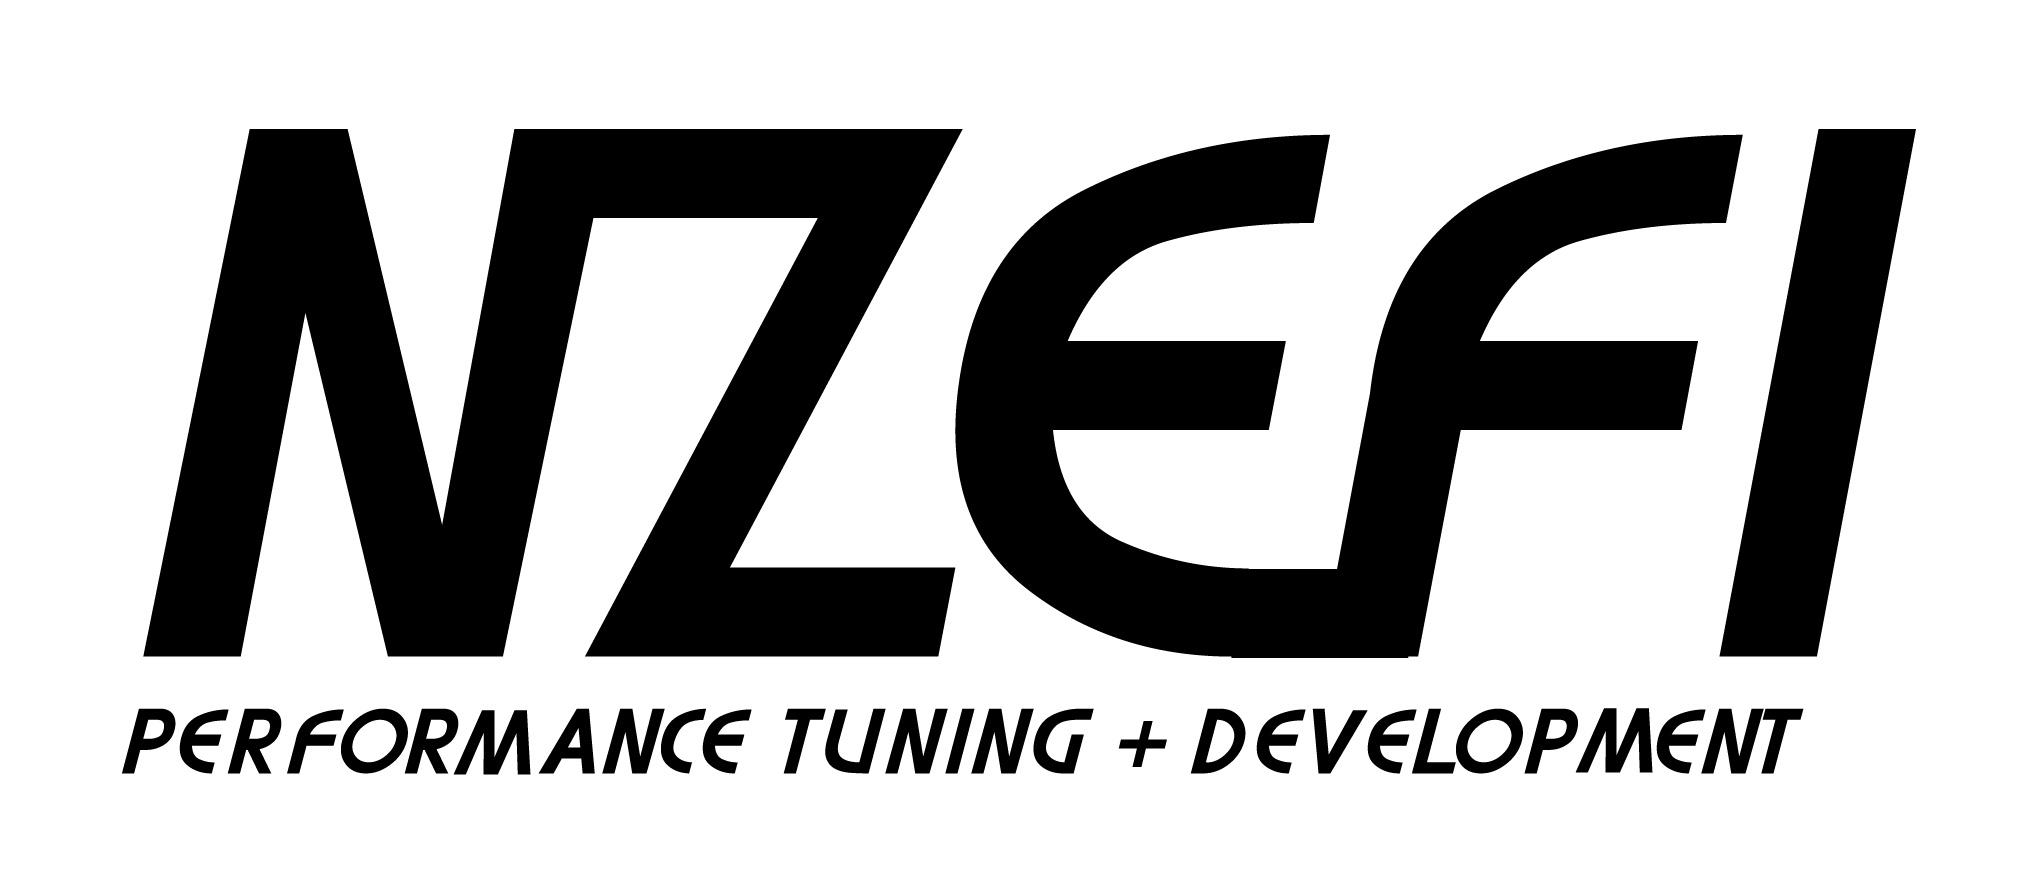 Nzefi Engine Management Solutions Mitsubishi Wiring Harness Nz